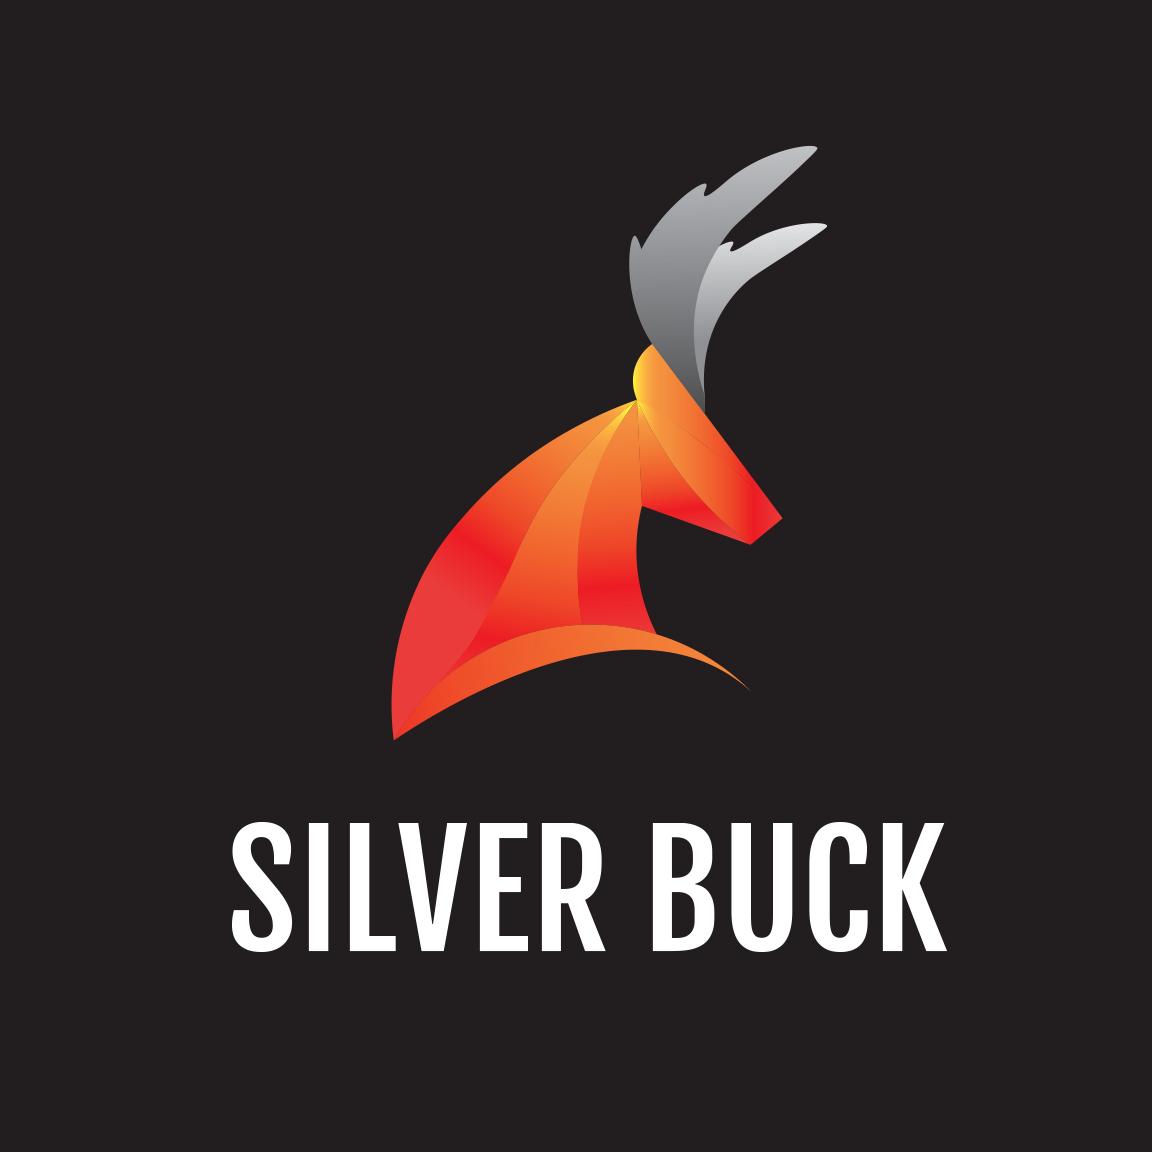 Silver Buck logo